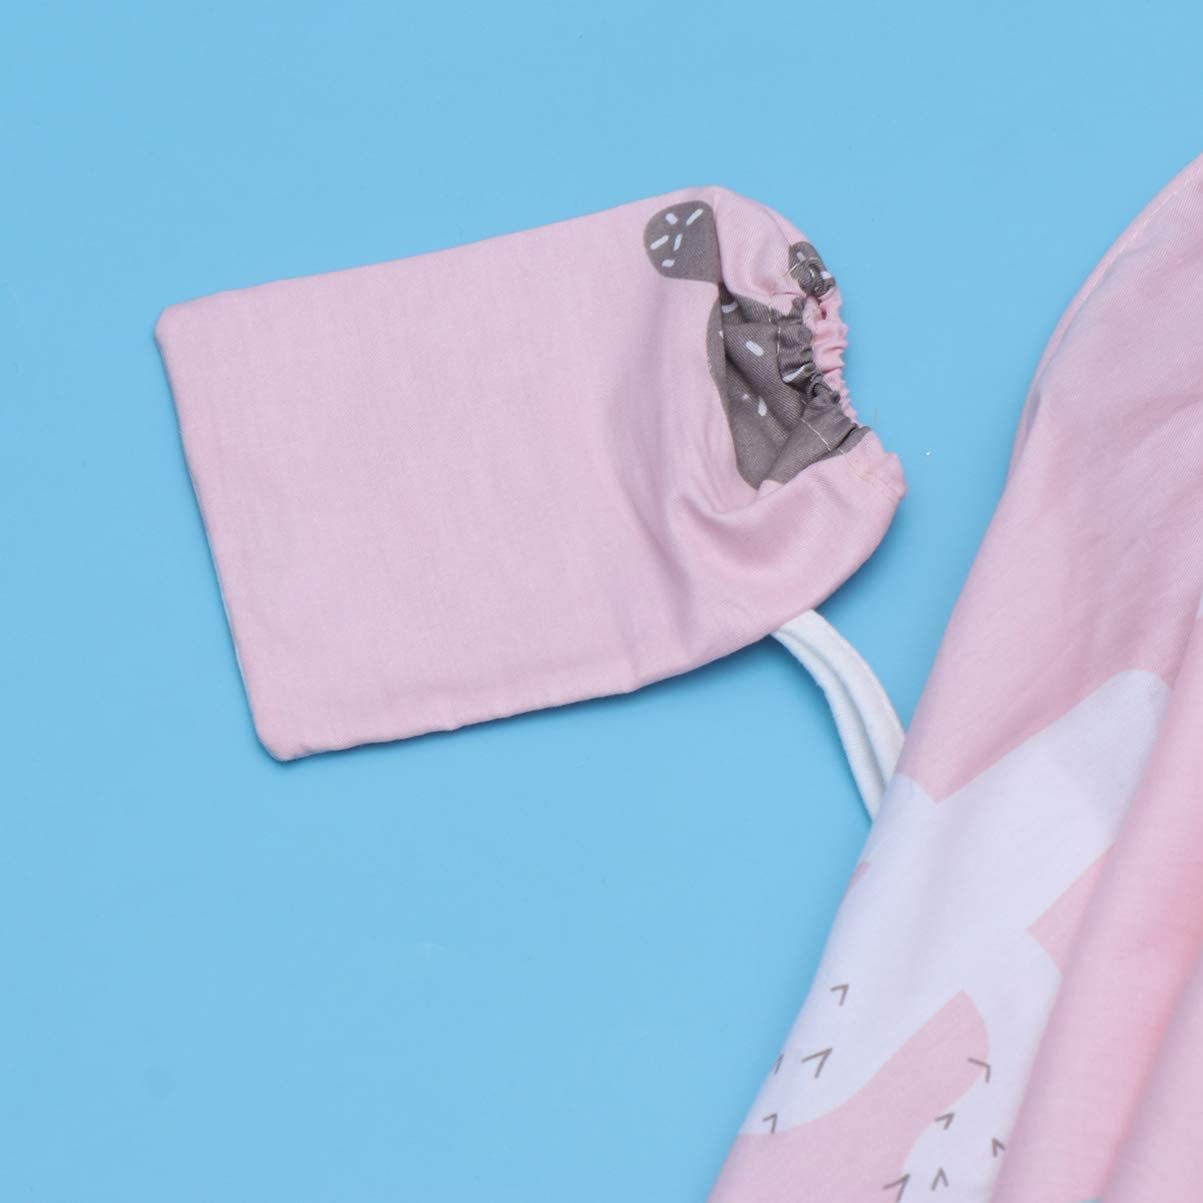 Artibetter Cubierta de Lactancia Lactancia algod/ón privacidad Cubierta de alimentaci/ón Delantal de Lactancia para Lactancia Animal